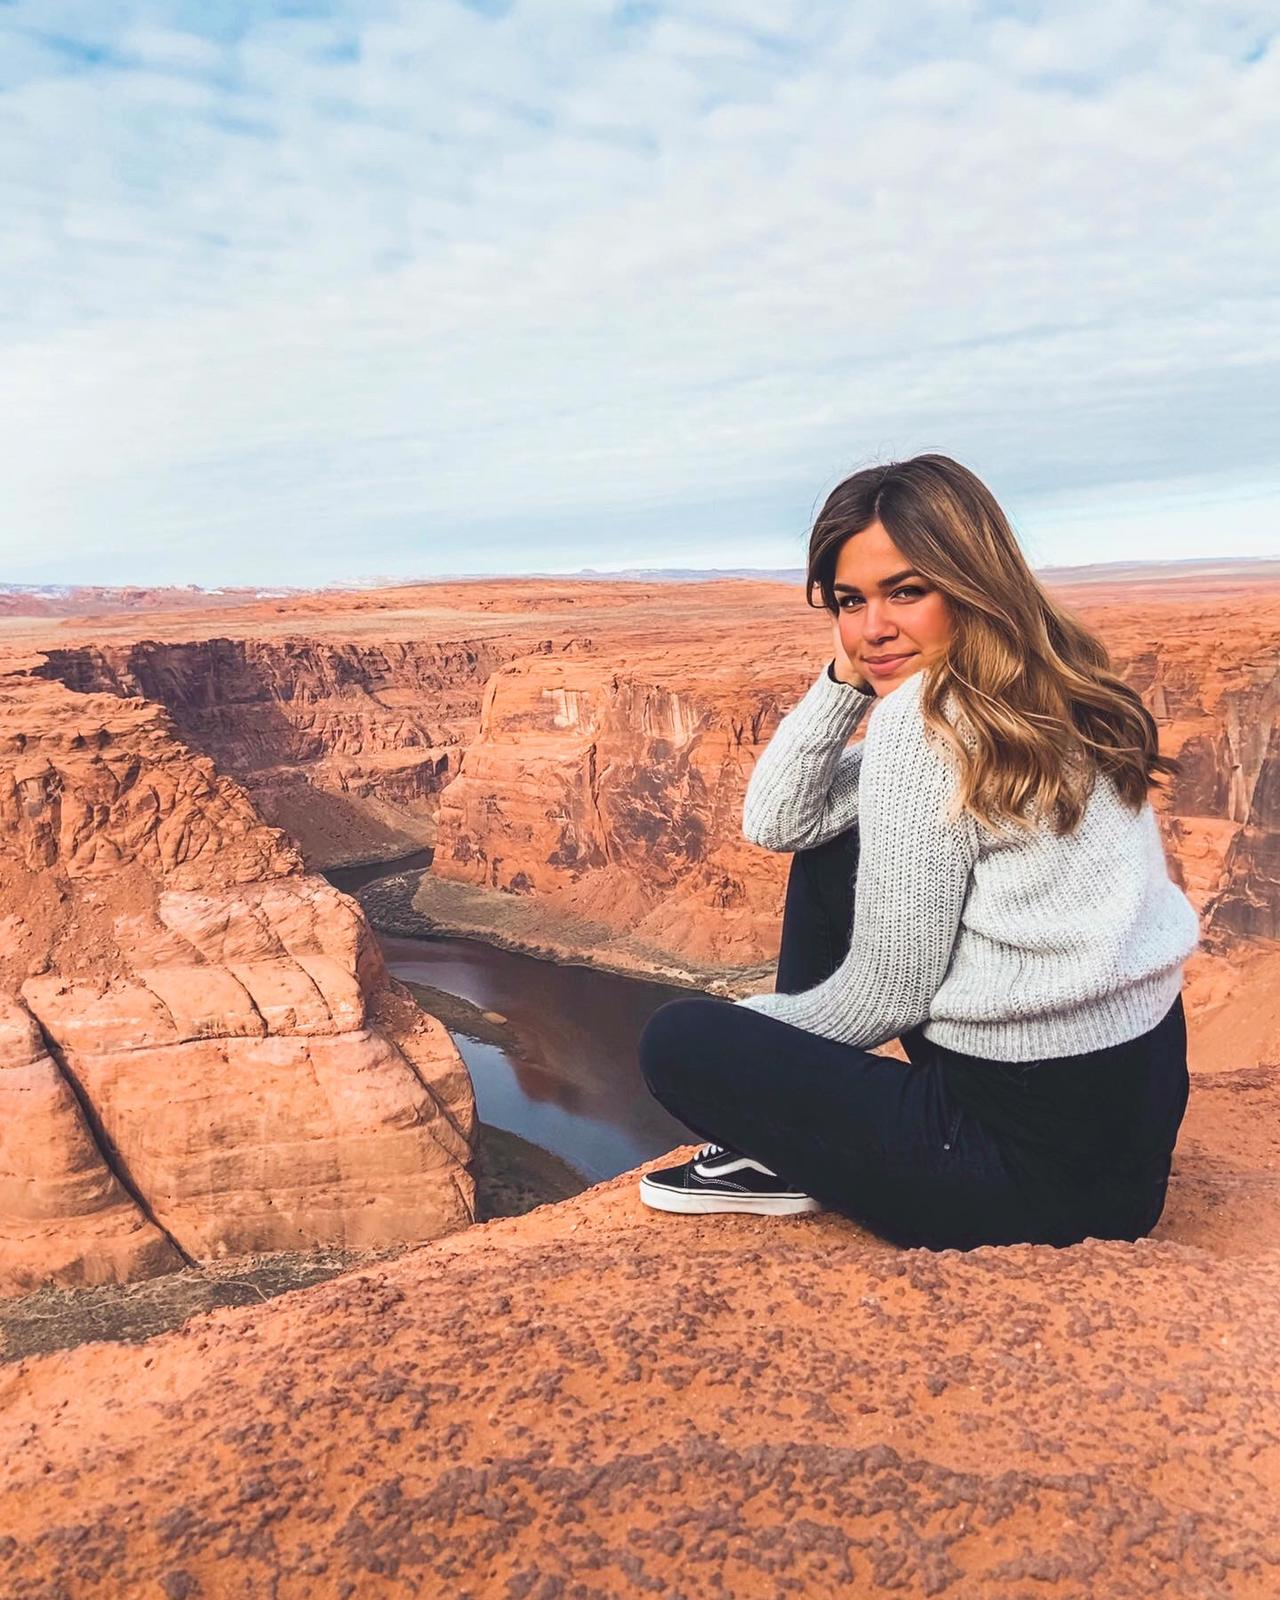 ragazza al gran canyon